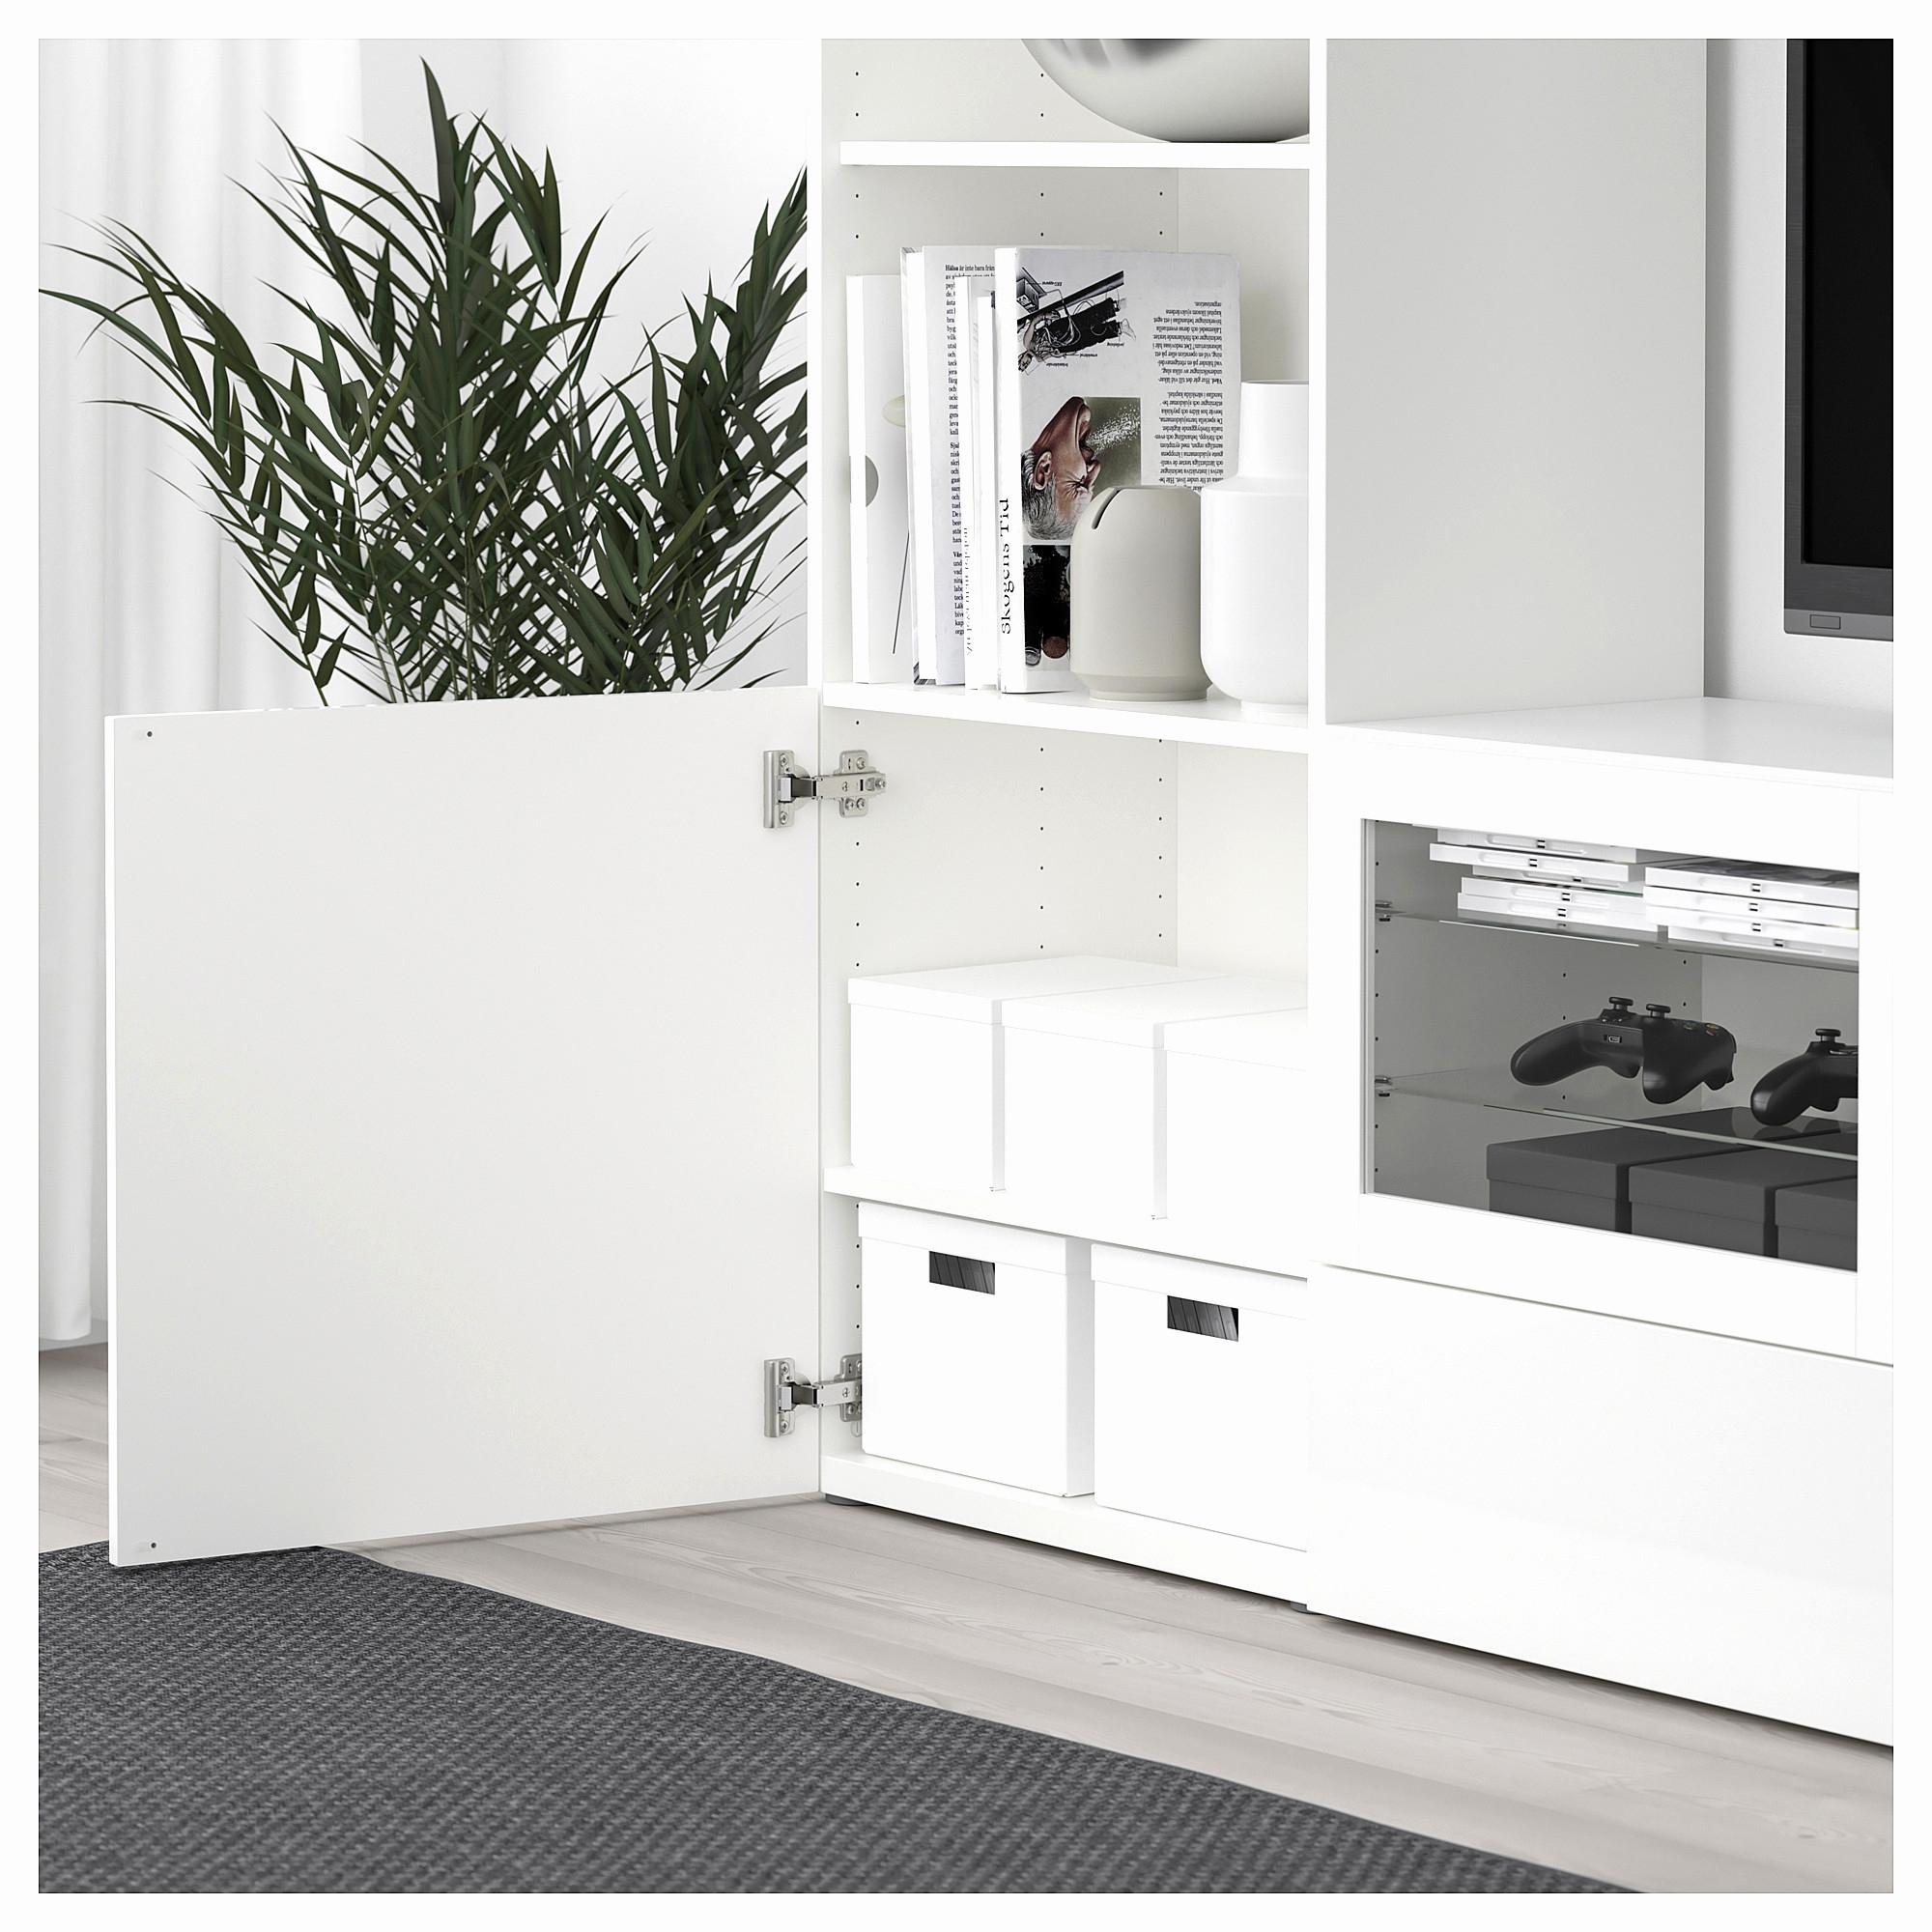 Ikea Salles De Bains Frais Images Armoire Salle De Bain Ikea Inspiré Meuble Rangement Salle De Bain